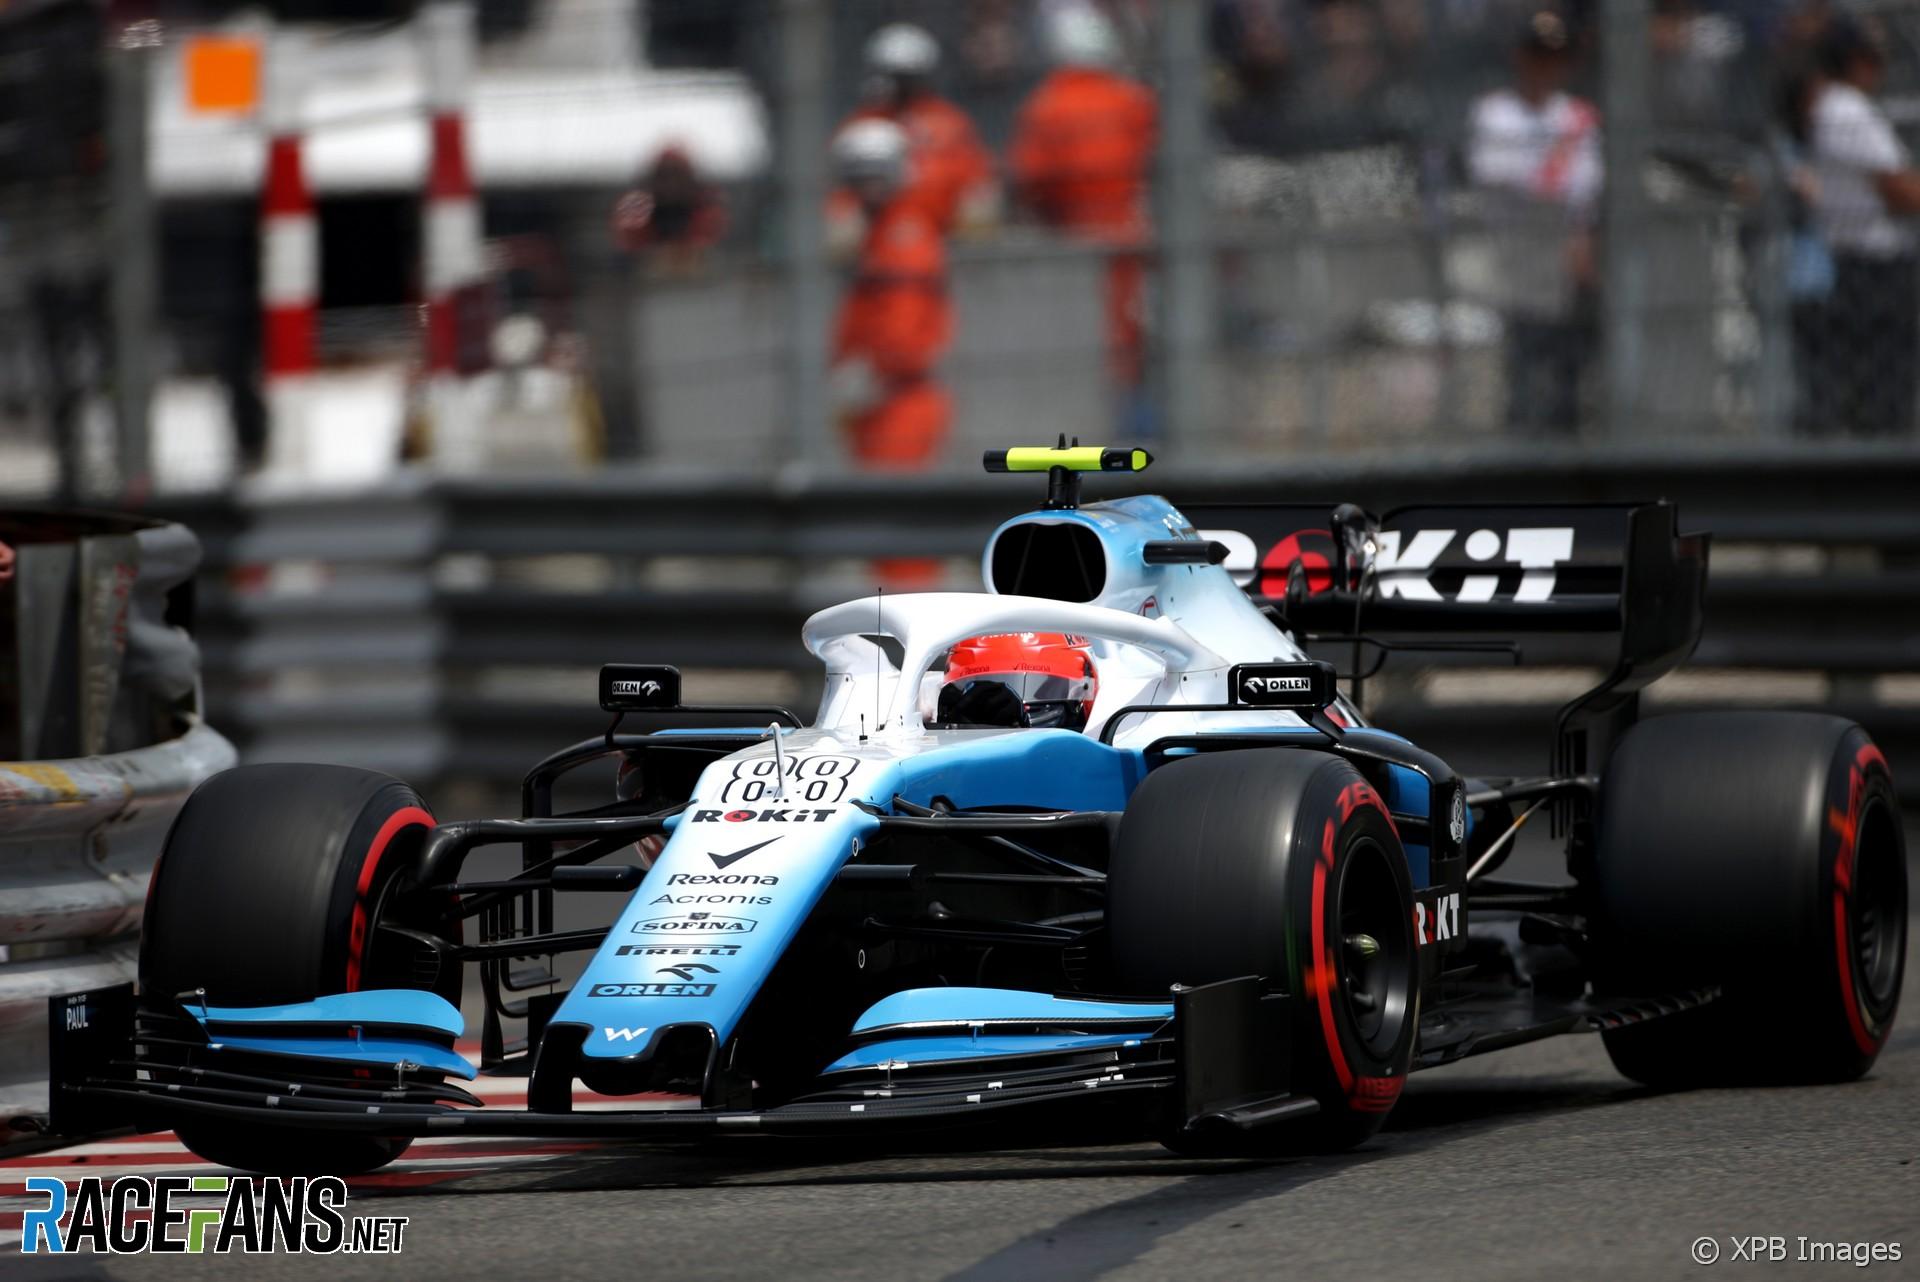 Robert Kubica, Williams, Monaco, 2019 · RaceFans